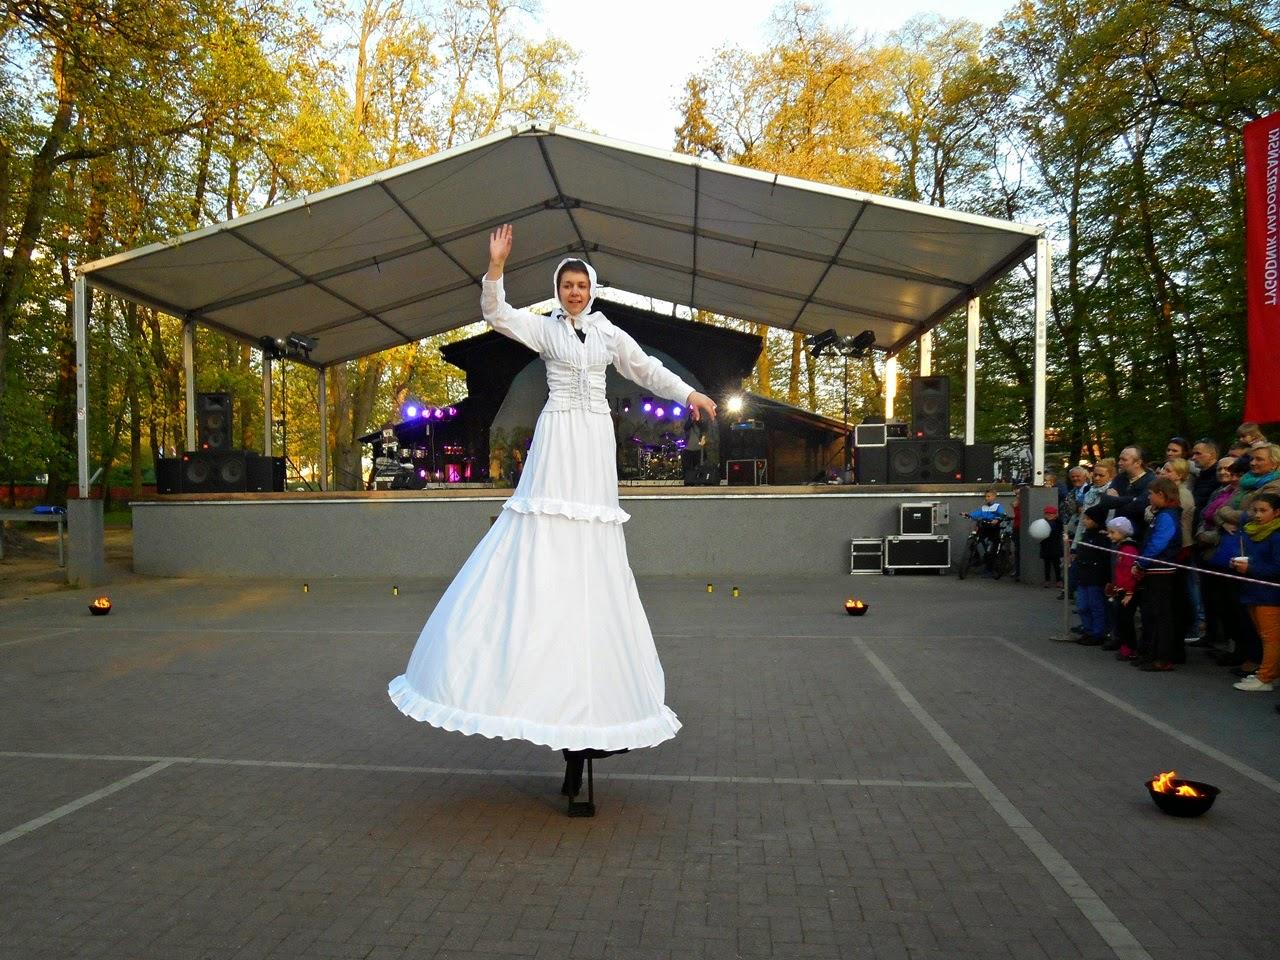 sztuka, przedstawienie, don Juan, Wolsztyn